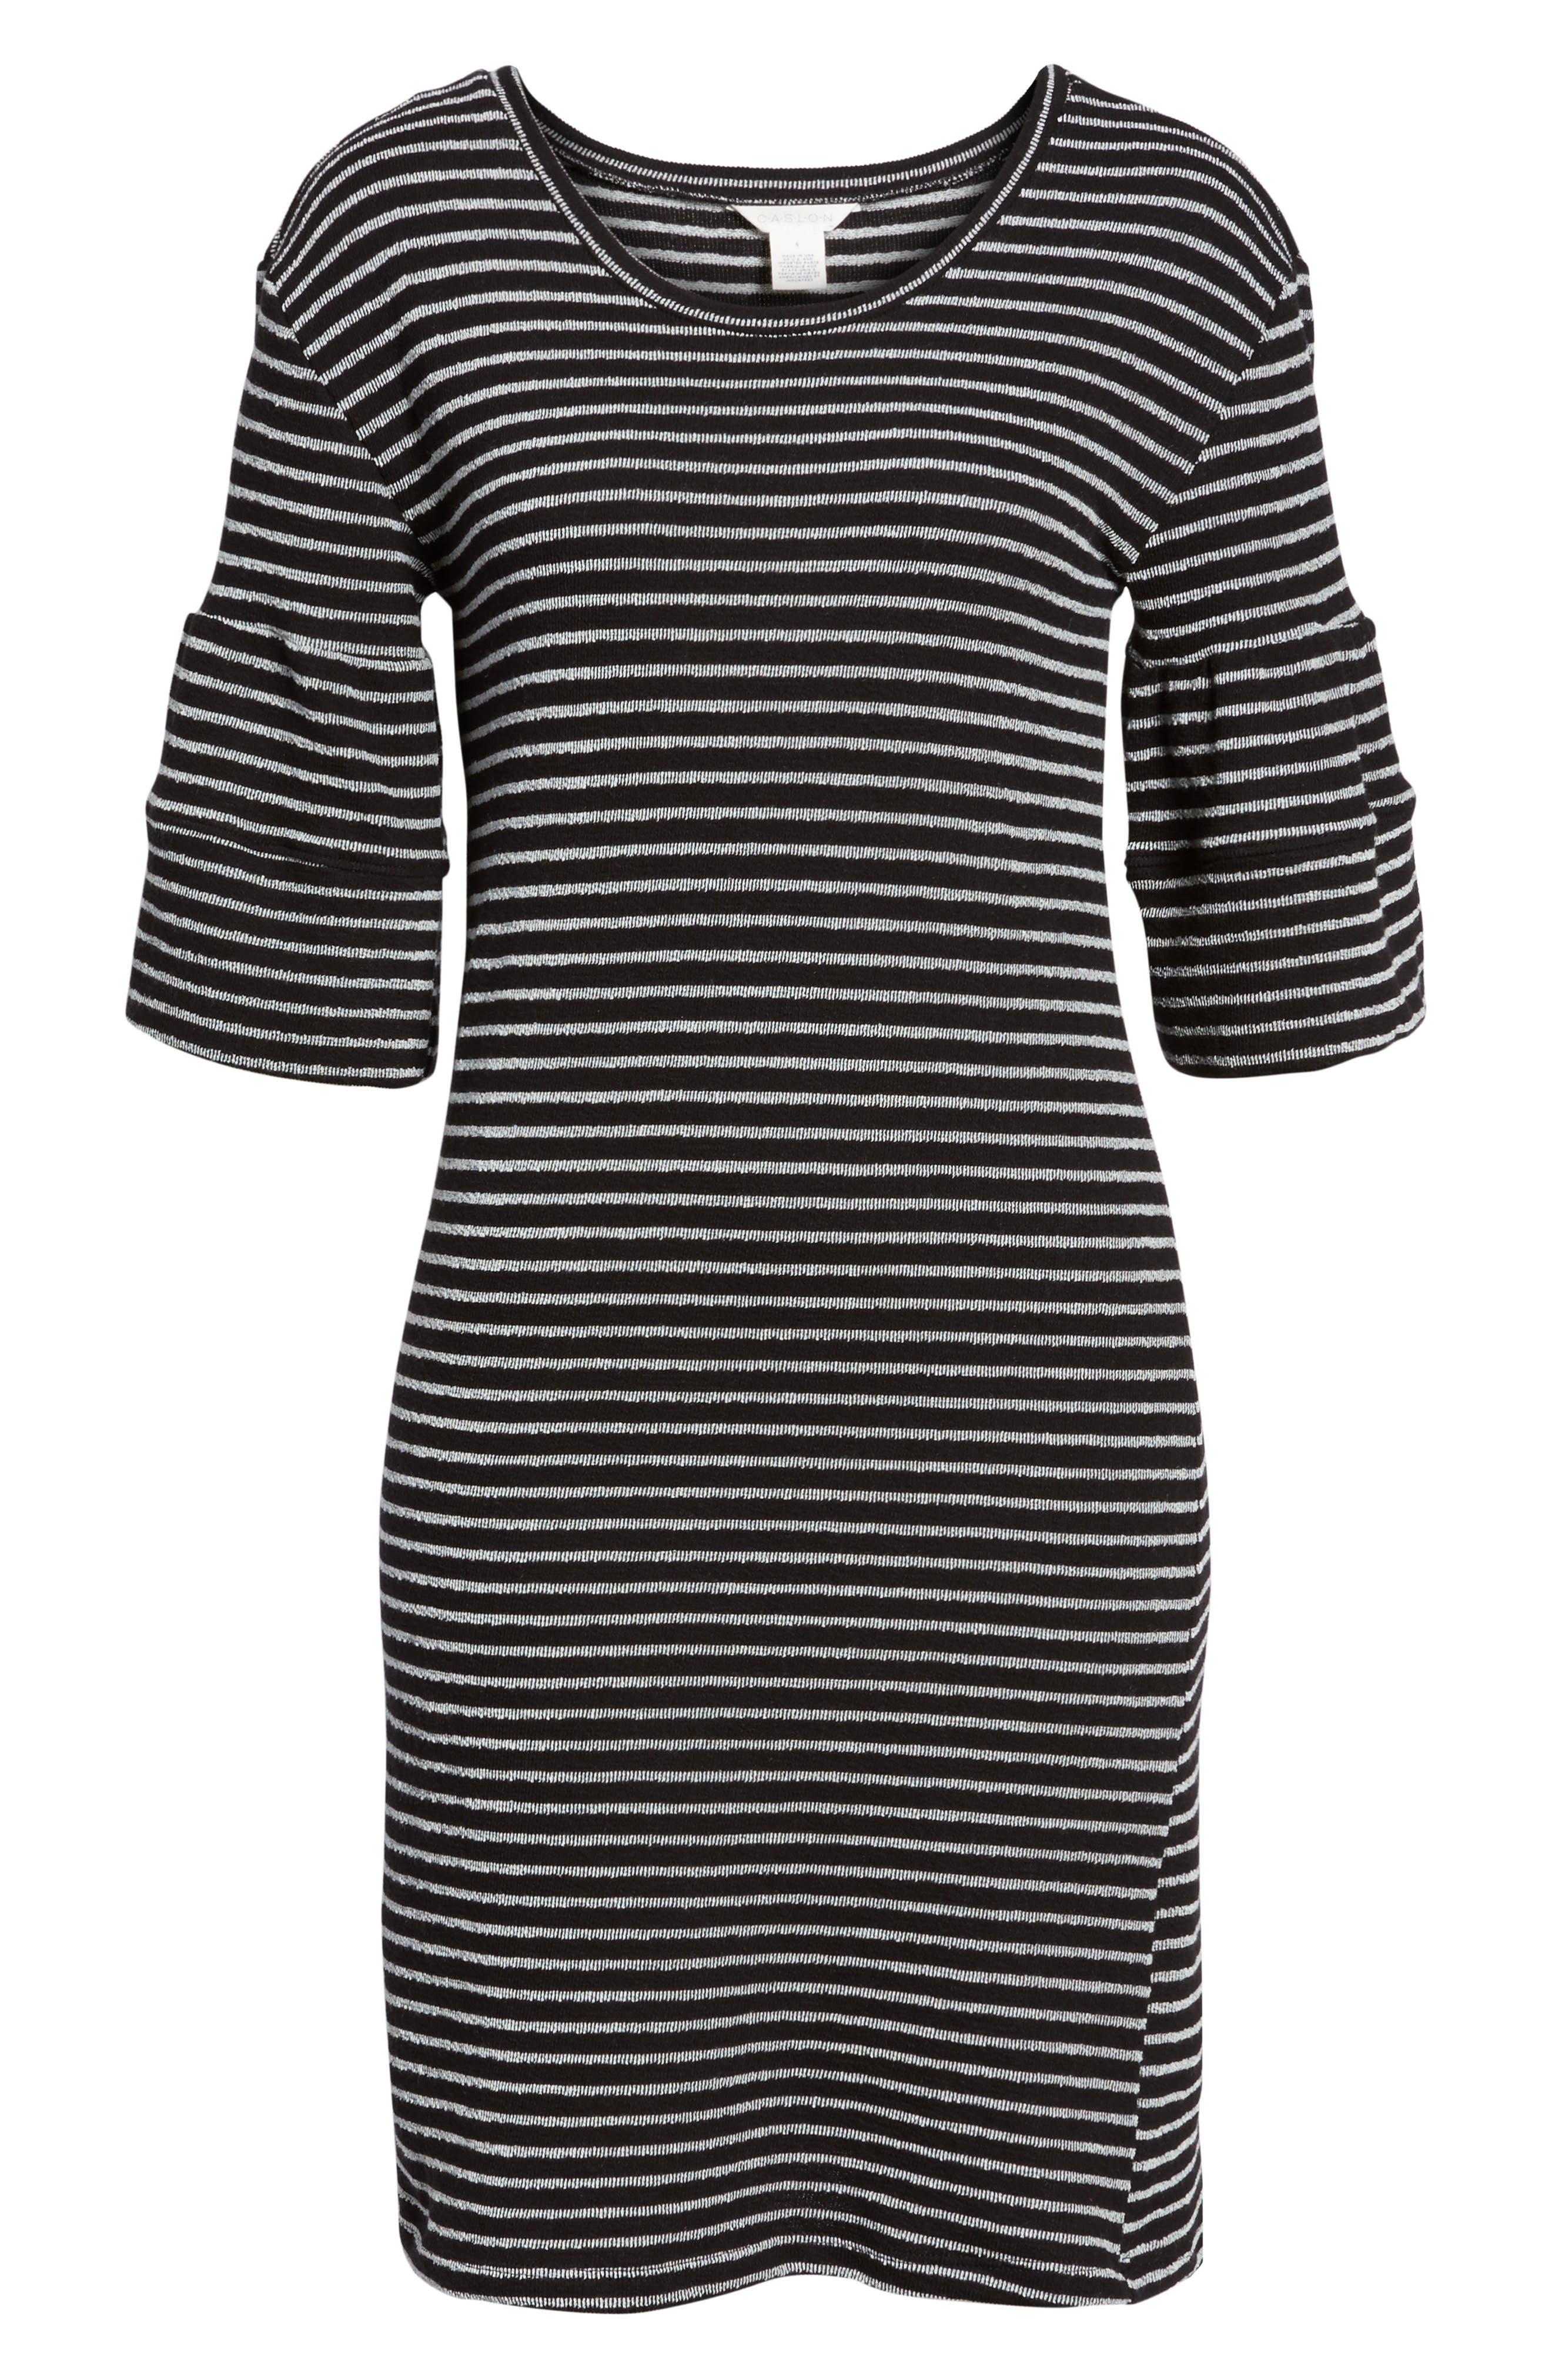 Ruffle Sleeve Knit Dress,                             Alternate thumbnail 16, color,